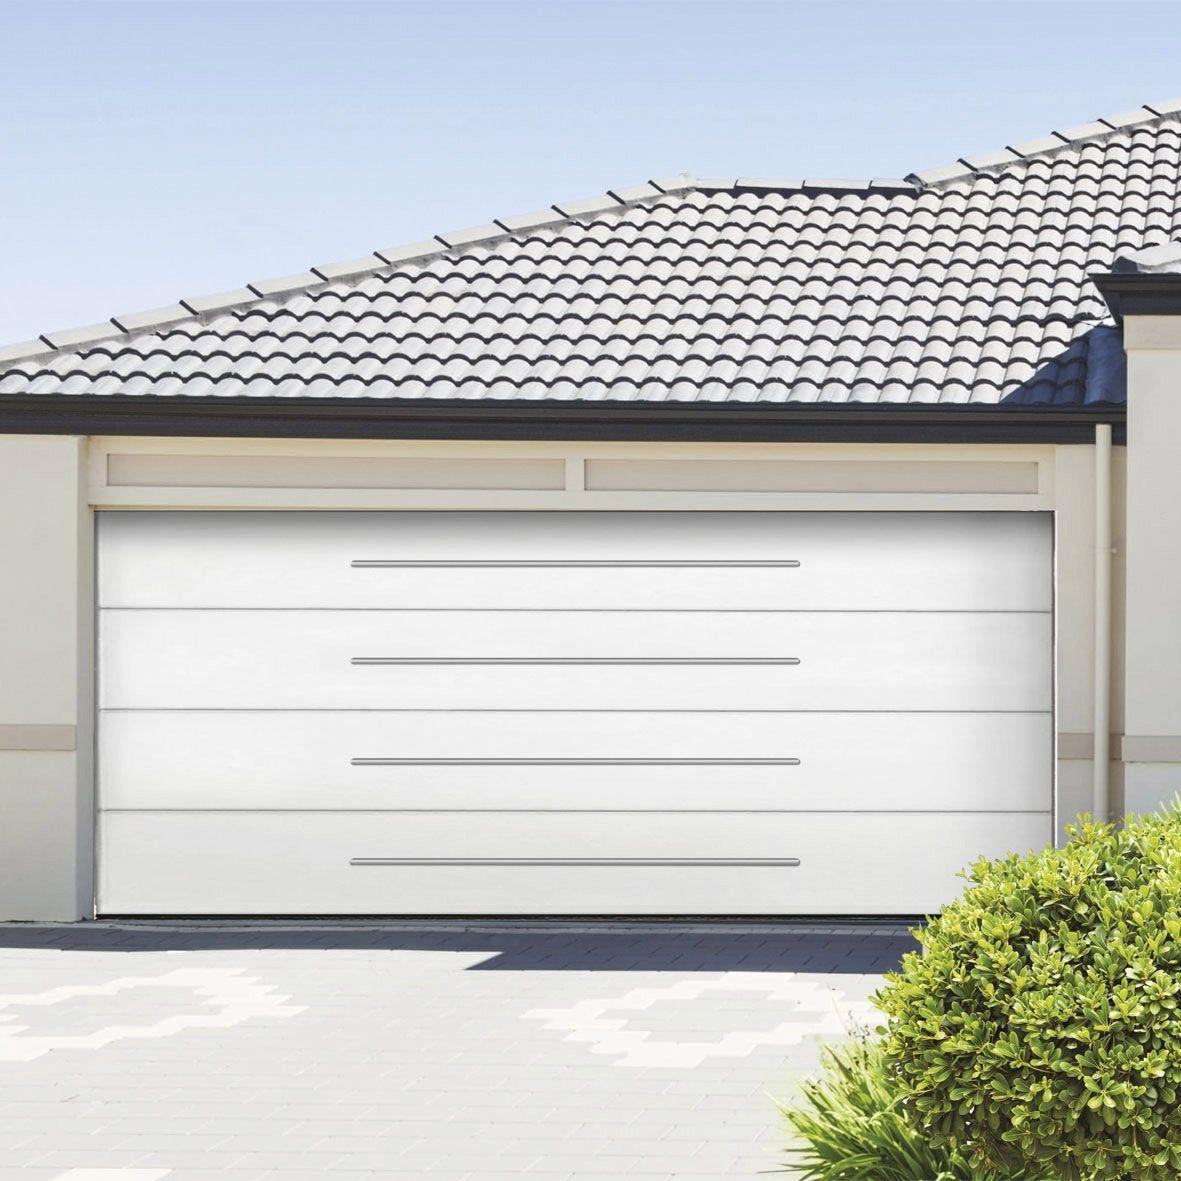 Porte De Garage Sectionnelle Stellium Motorisee H 200 X L 240 Cm Porte De Garage Sectionnelle Porte Garage Et Garage